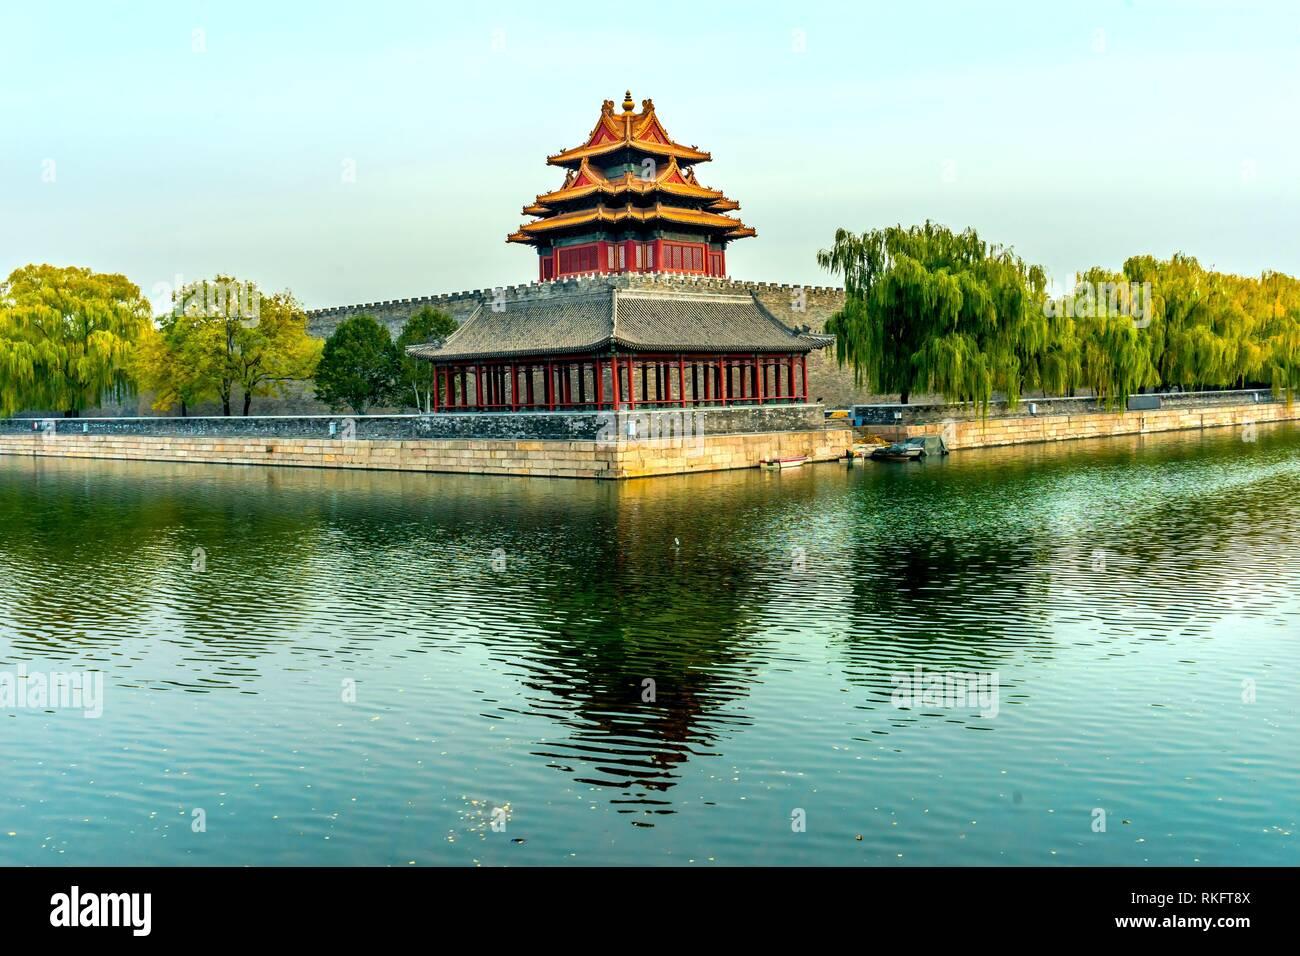 Pfeil Watch Tower Gugong Verbotene Stadt Graben Canal Plaace Wand Beijing China. Der Kaiserpalast in den 1600er Jahren in der Ming Dynastie errichtet wurde. Stockbild